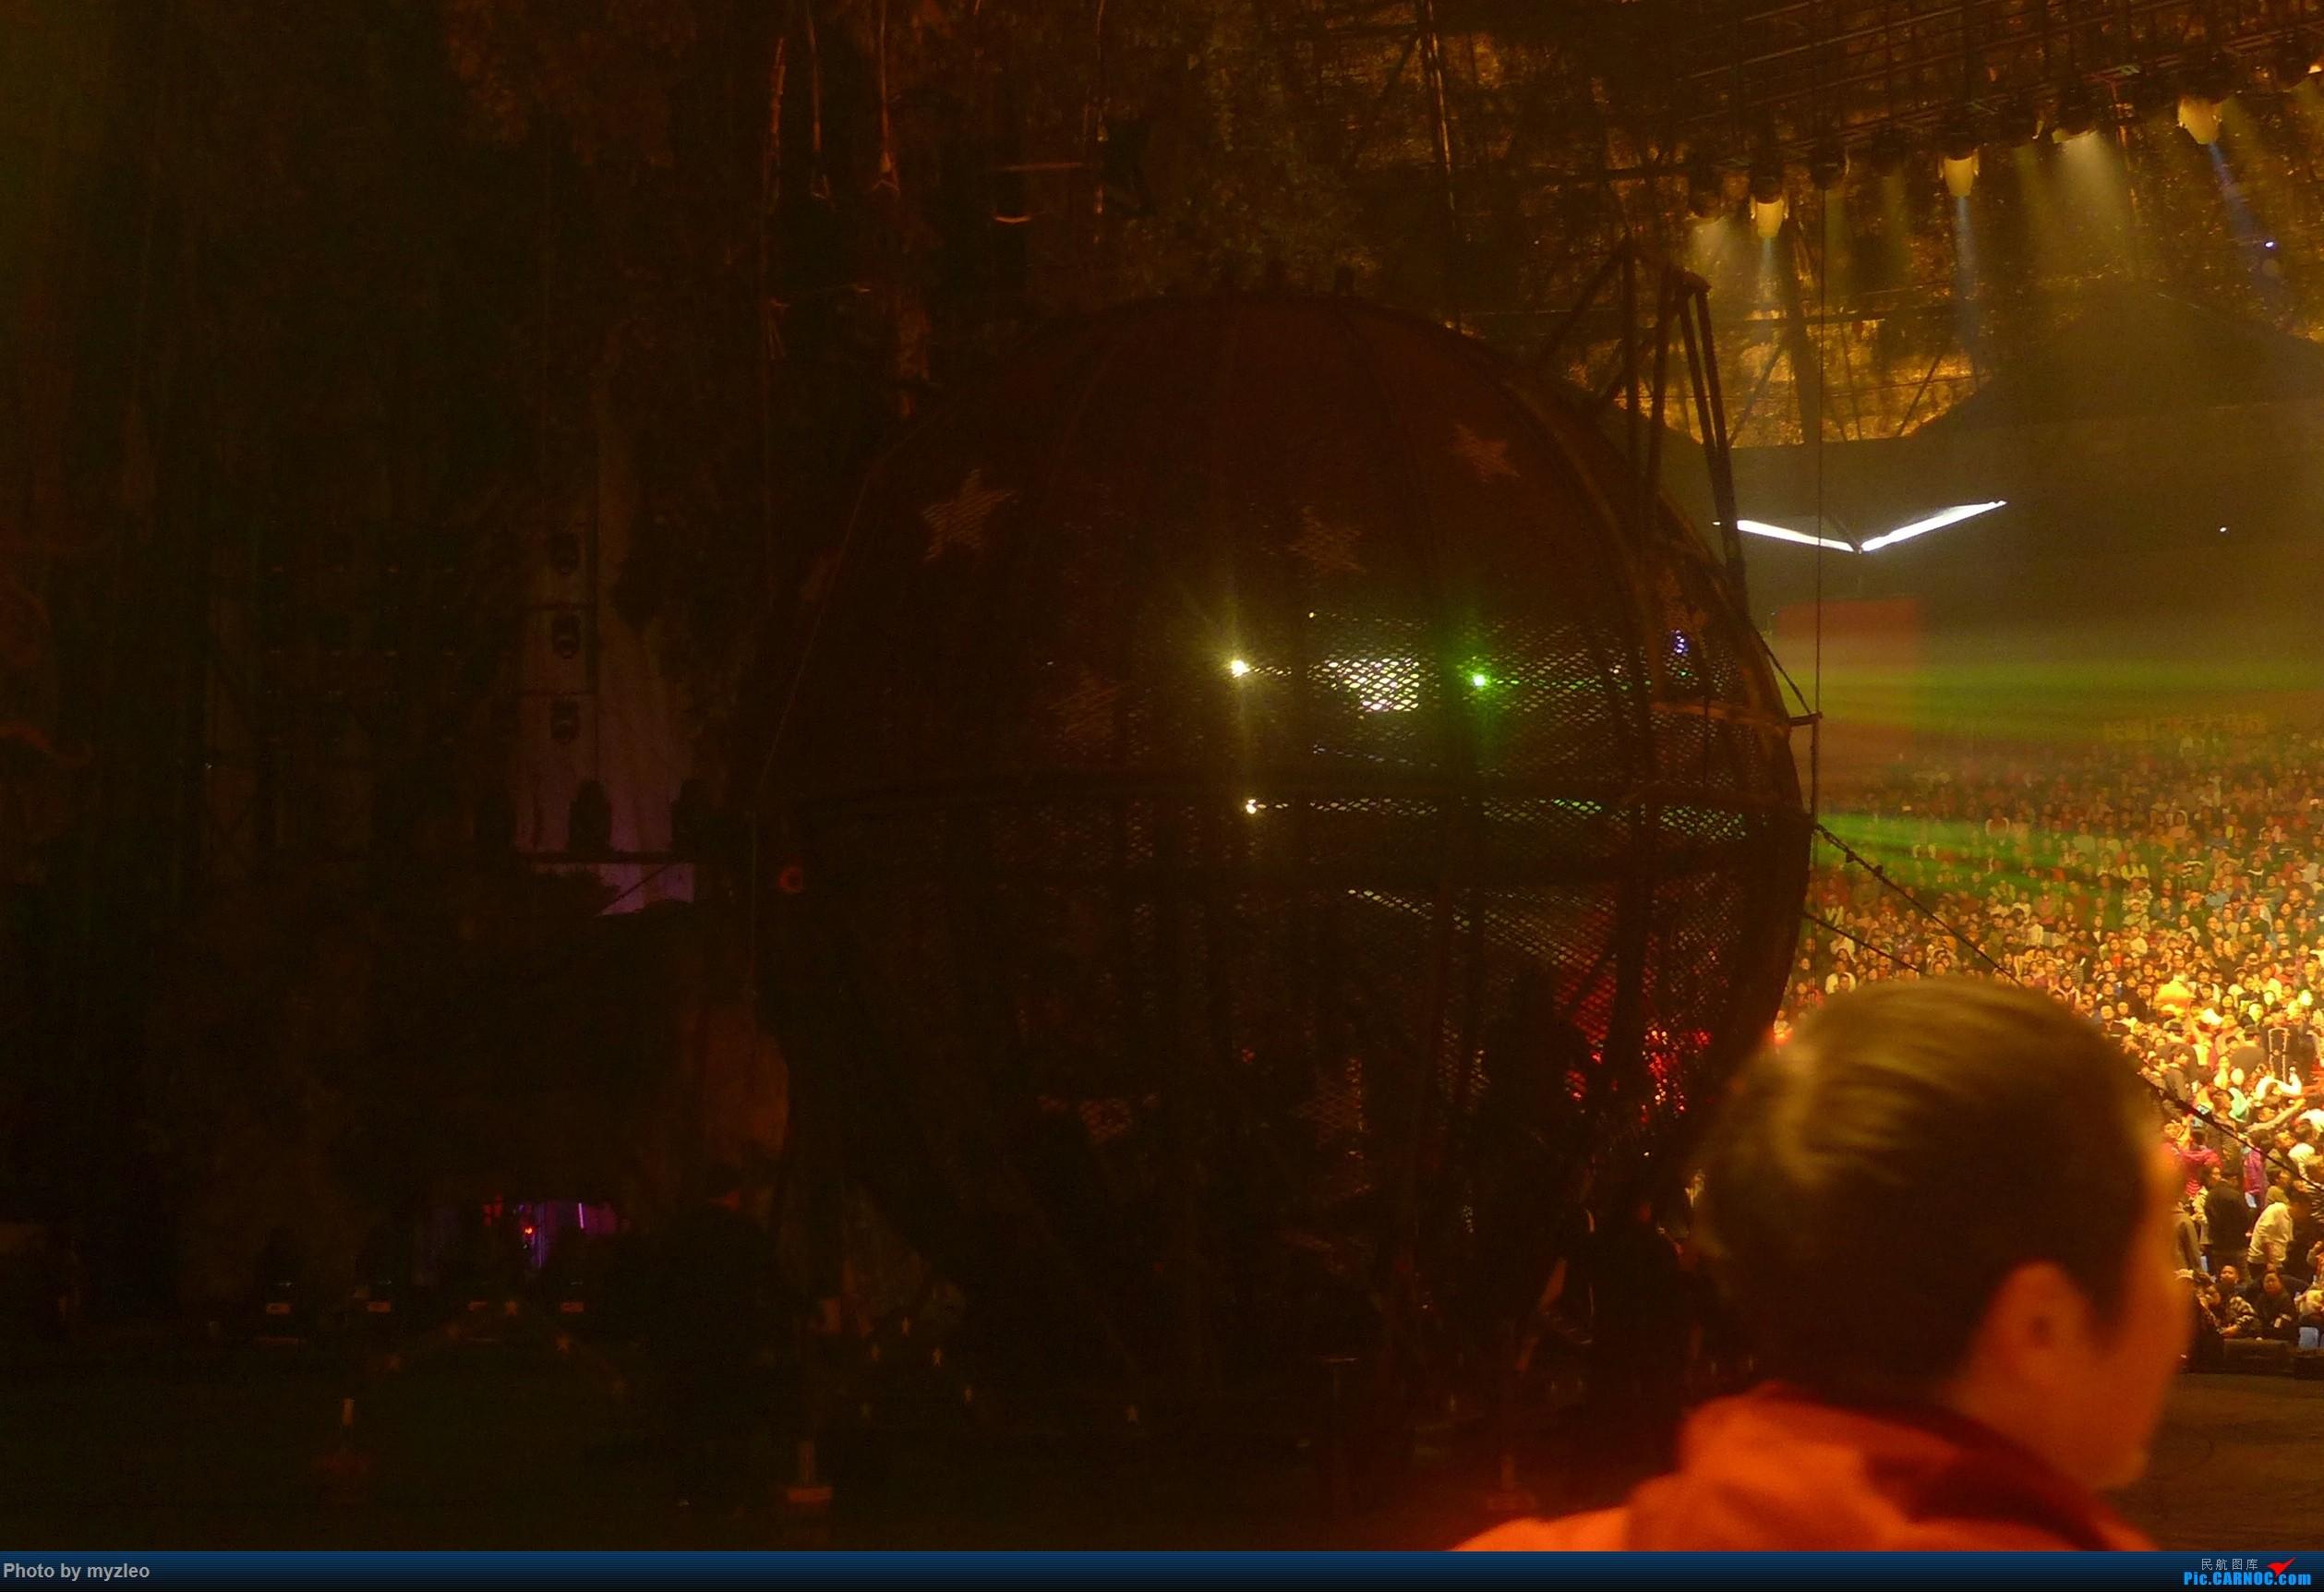 Re:[原创]【myzleo的游记1】六天五晚广州行——SHA-CAN上航商务舱初体验+广州城内